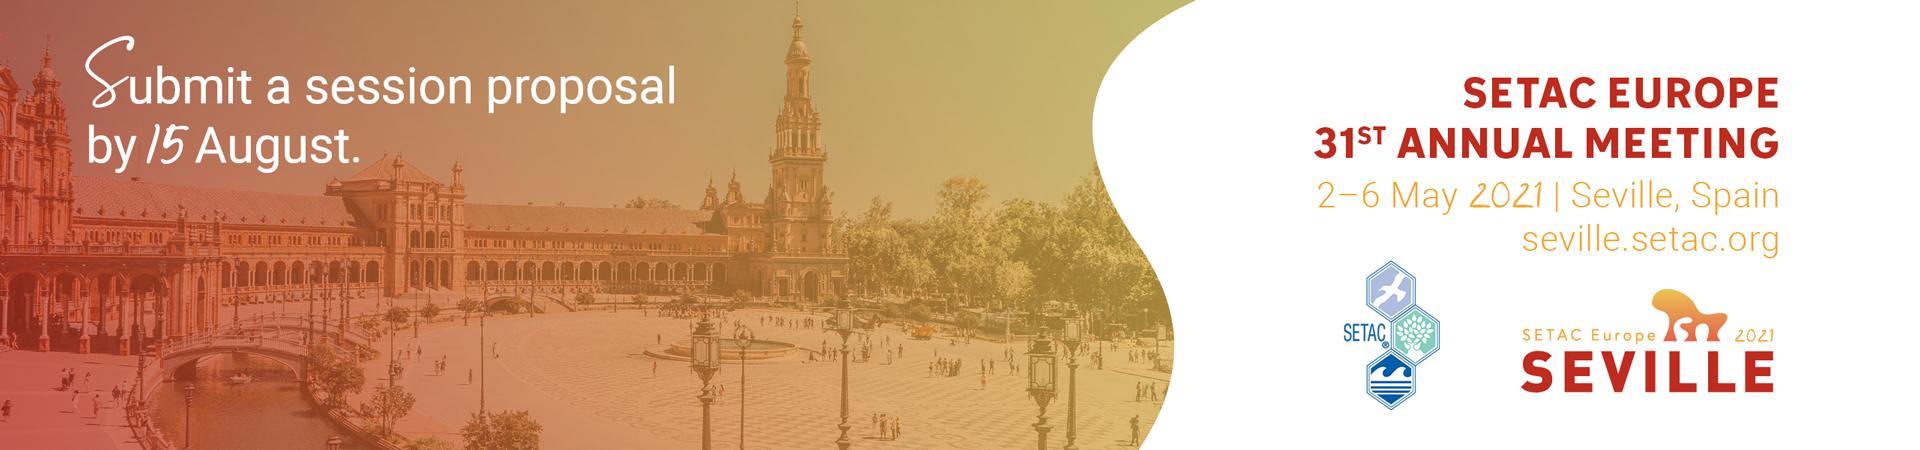 SETAC Seville call for sessions